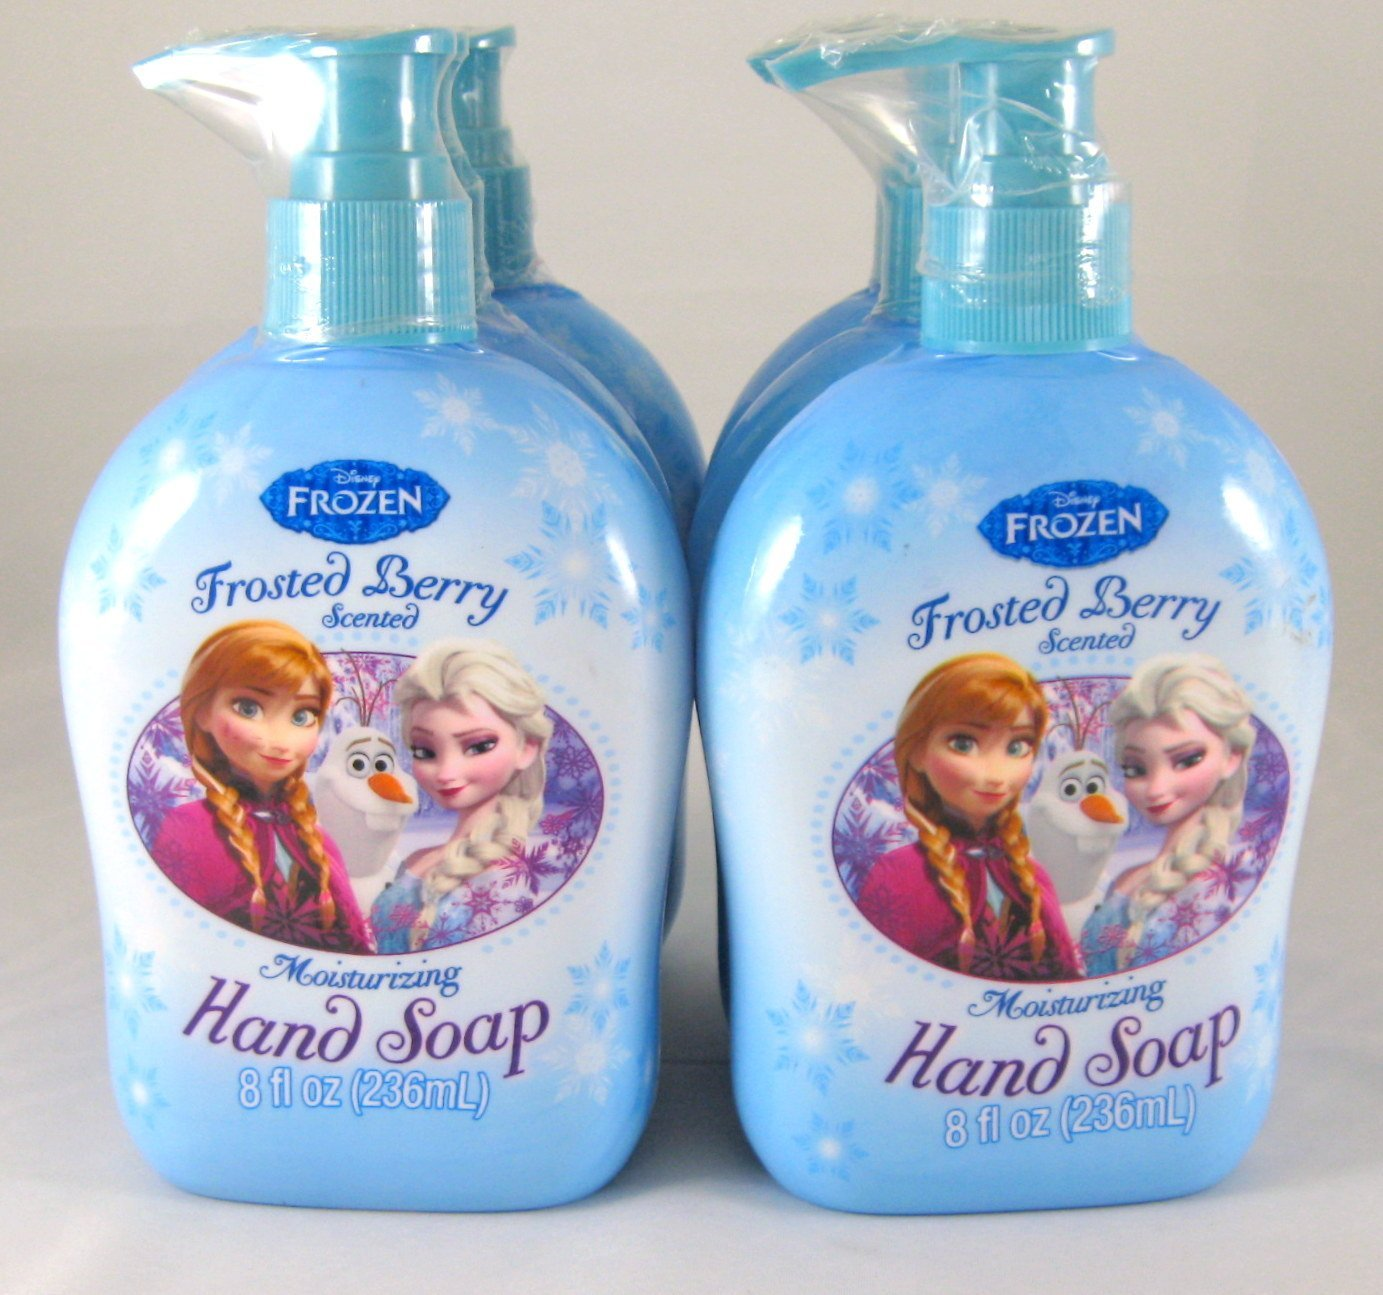 6 Pk, Disney Frozen Hand Soap 8 Fl. Oz Frosted Berry Scent